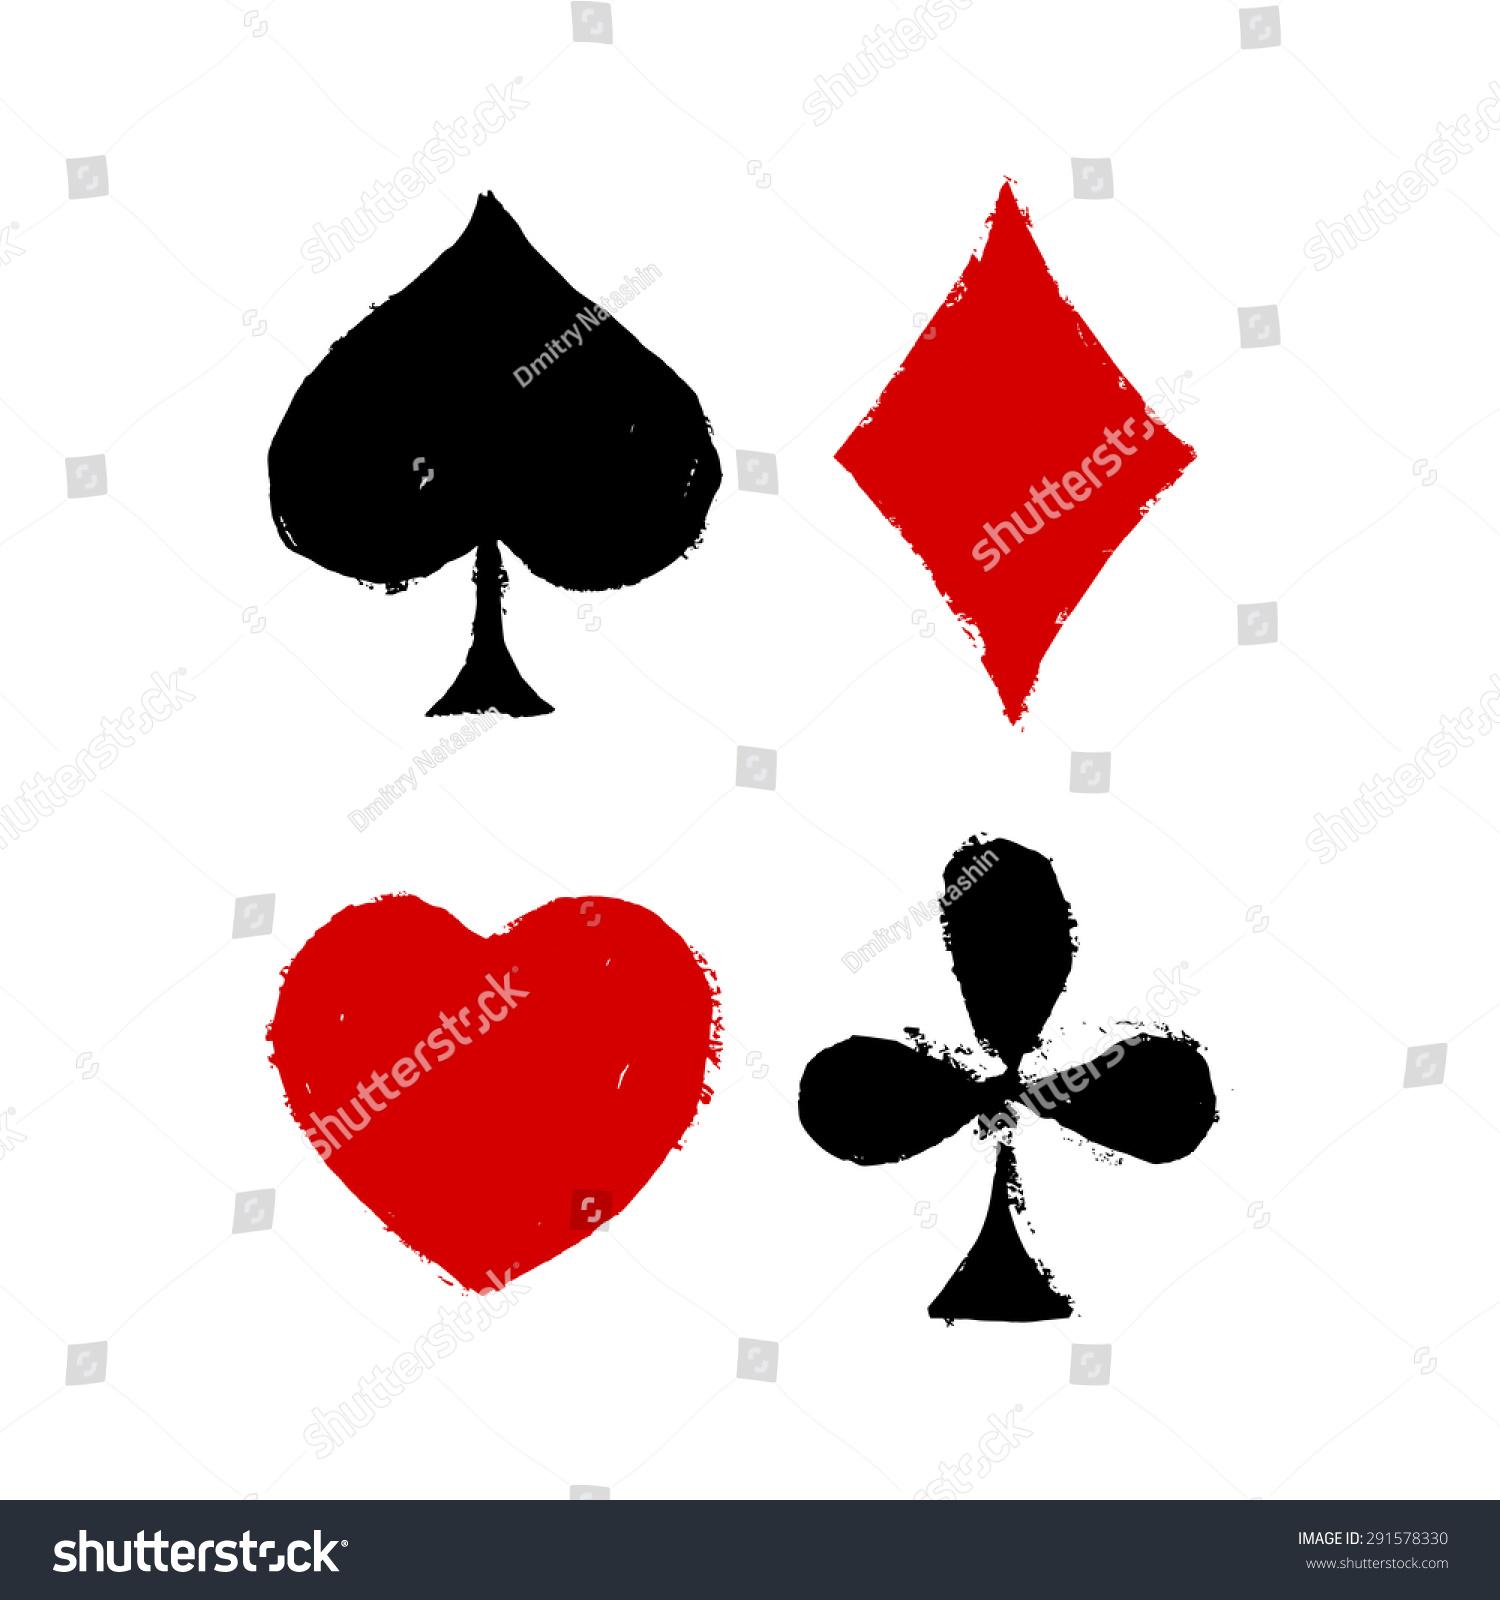 Vintage playing cards symbols vector illustration stock vector vintage playing cards symbols vector illustration biocorpaavc